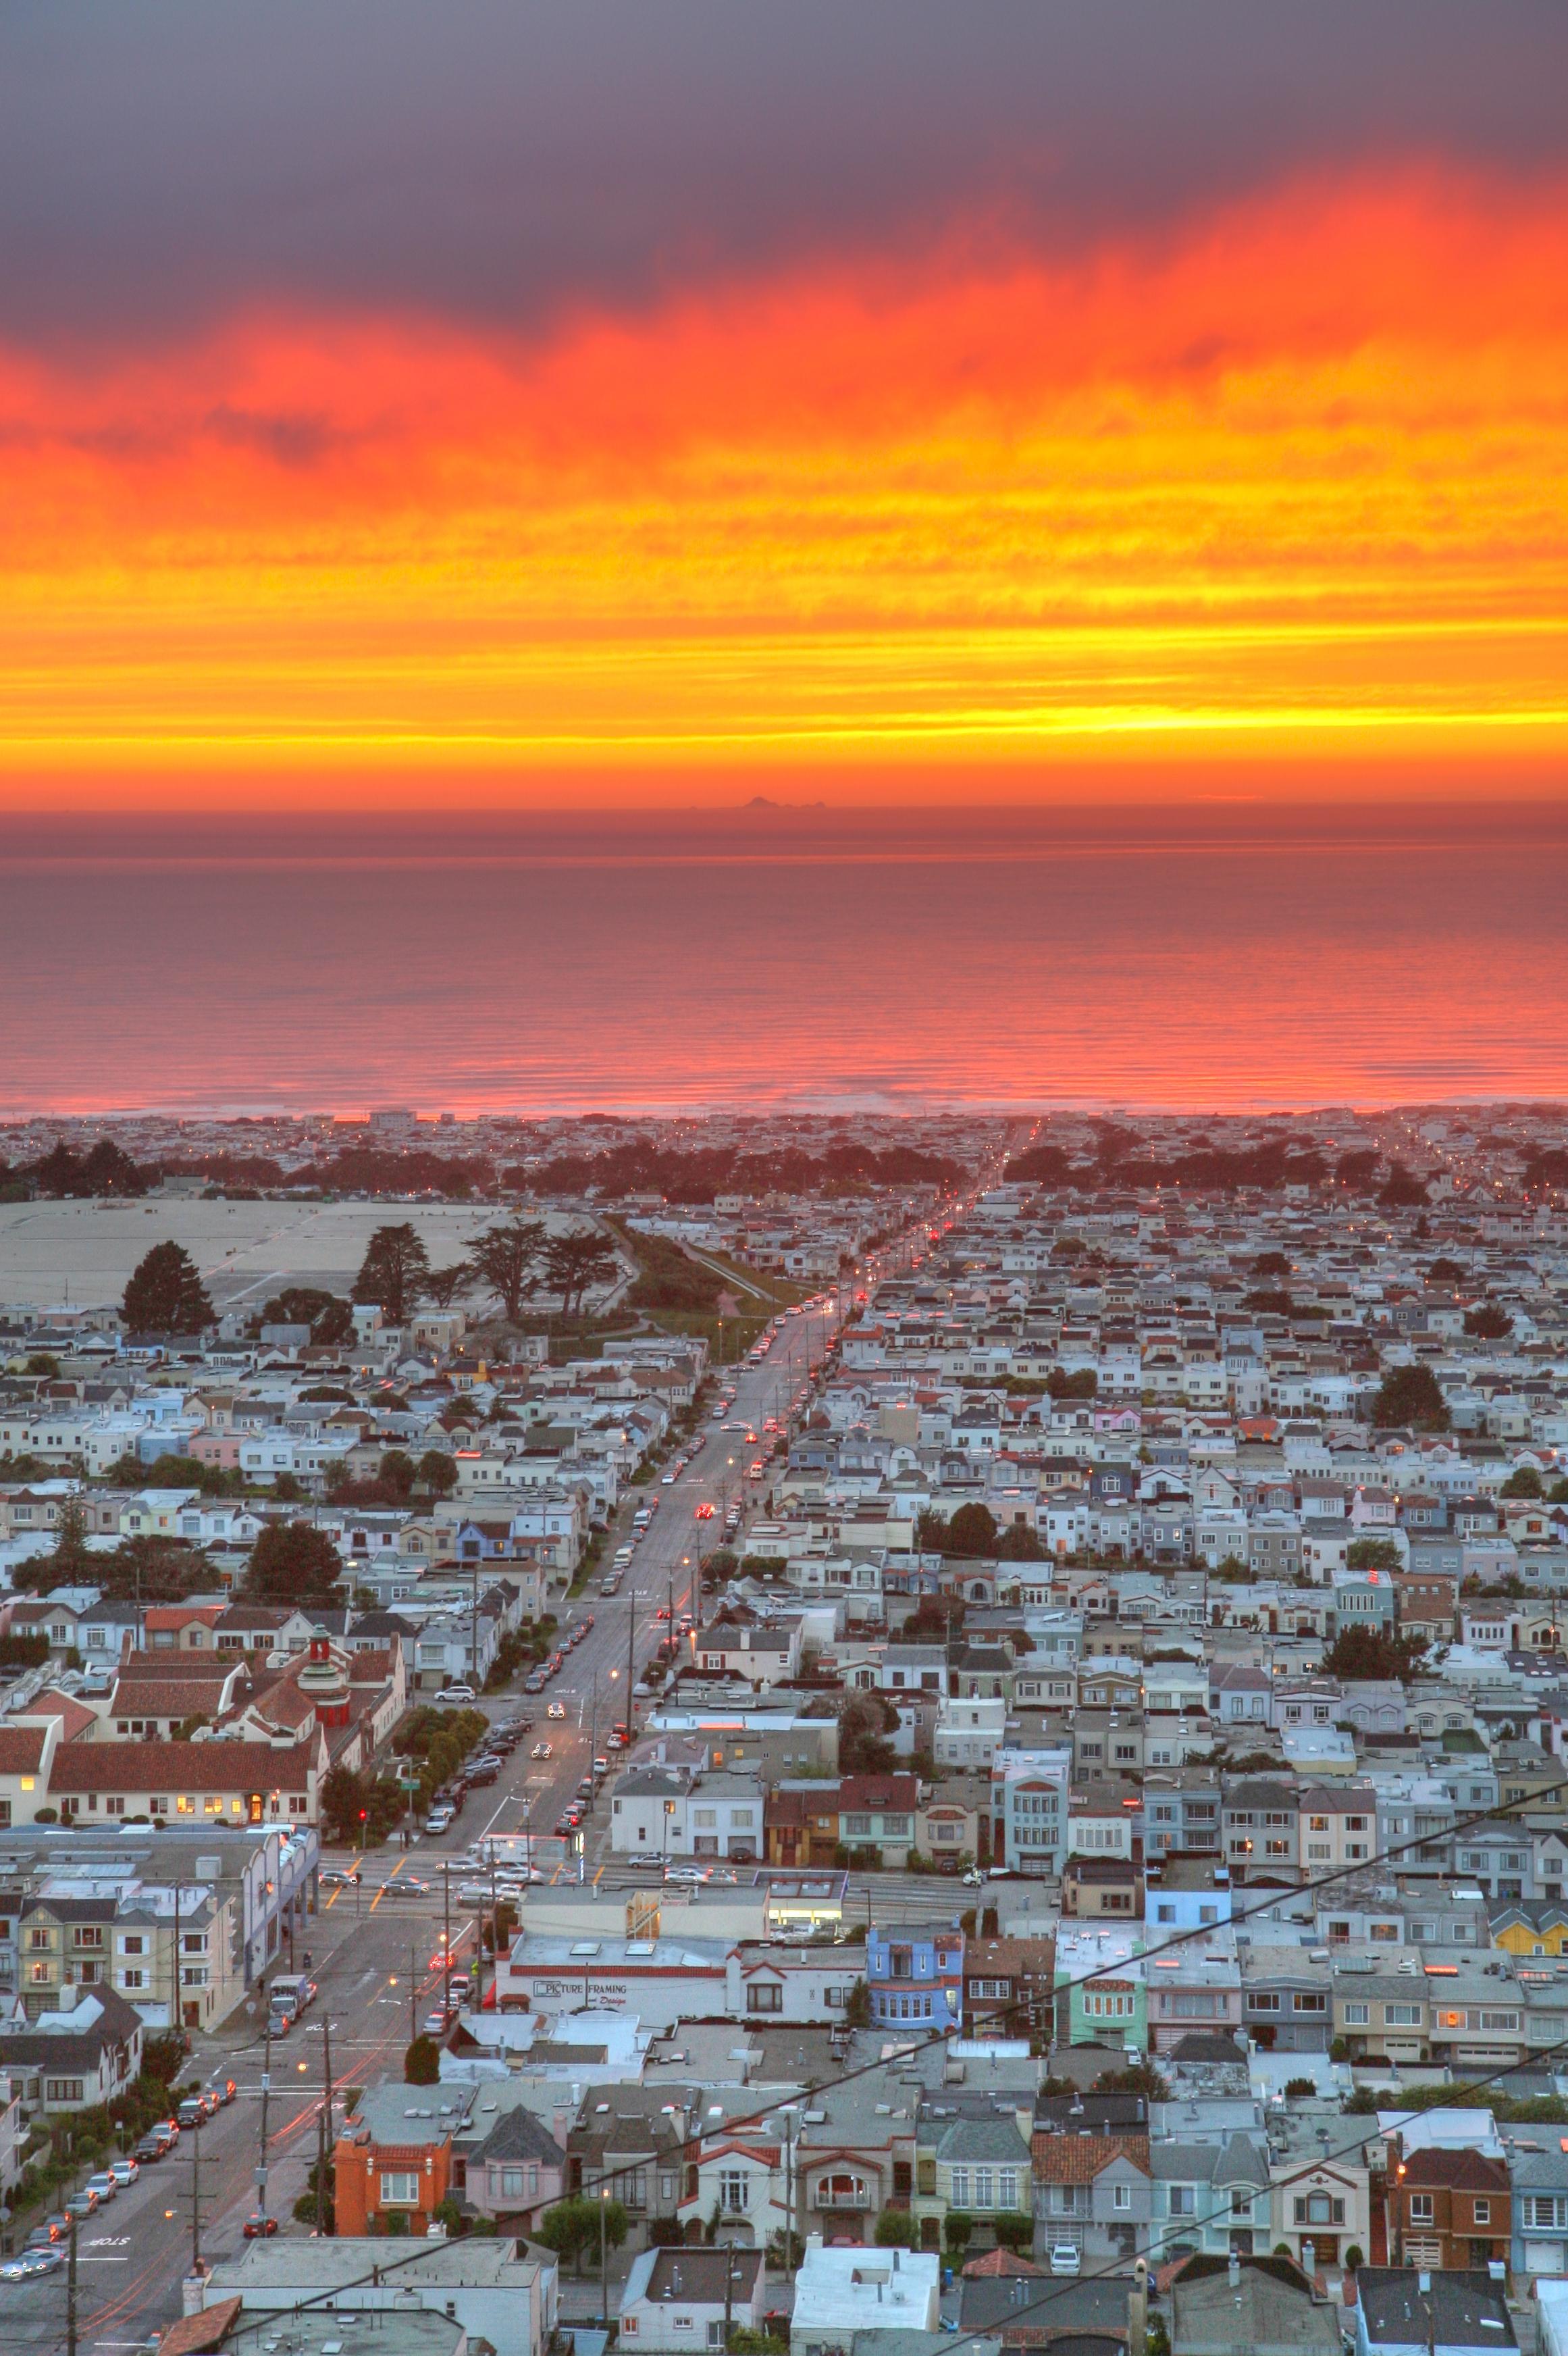 San Francisco Sunset District - Credit SF Brit http://www.flickr.com/photos/cnbattson/